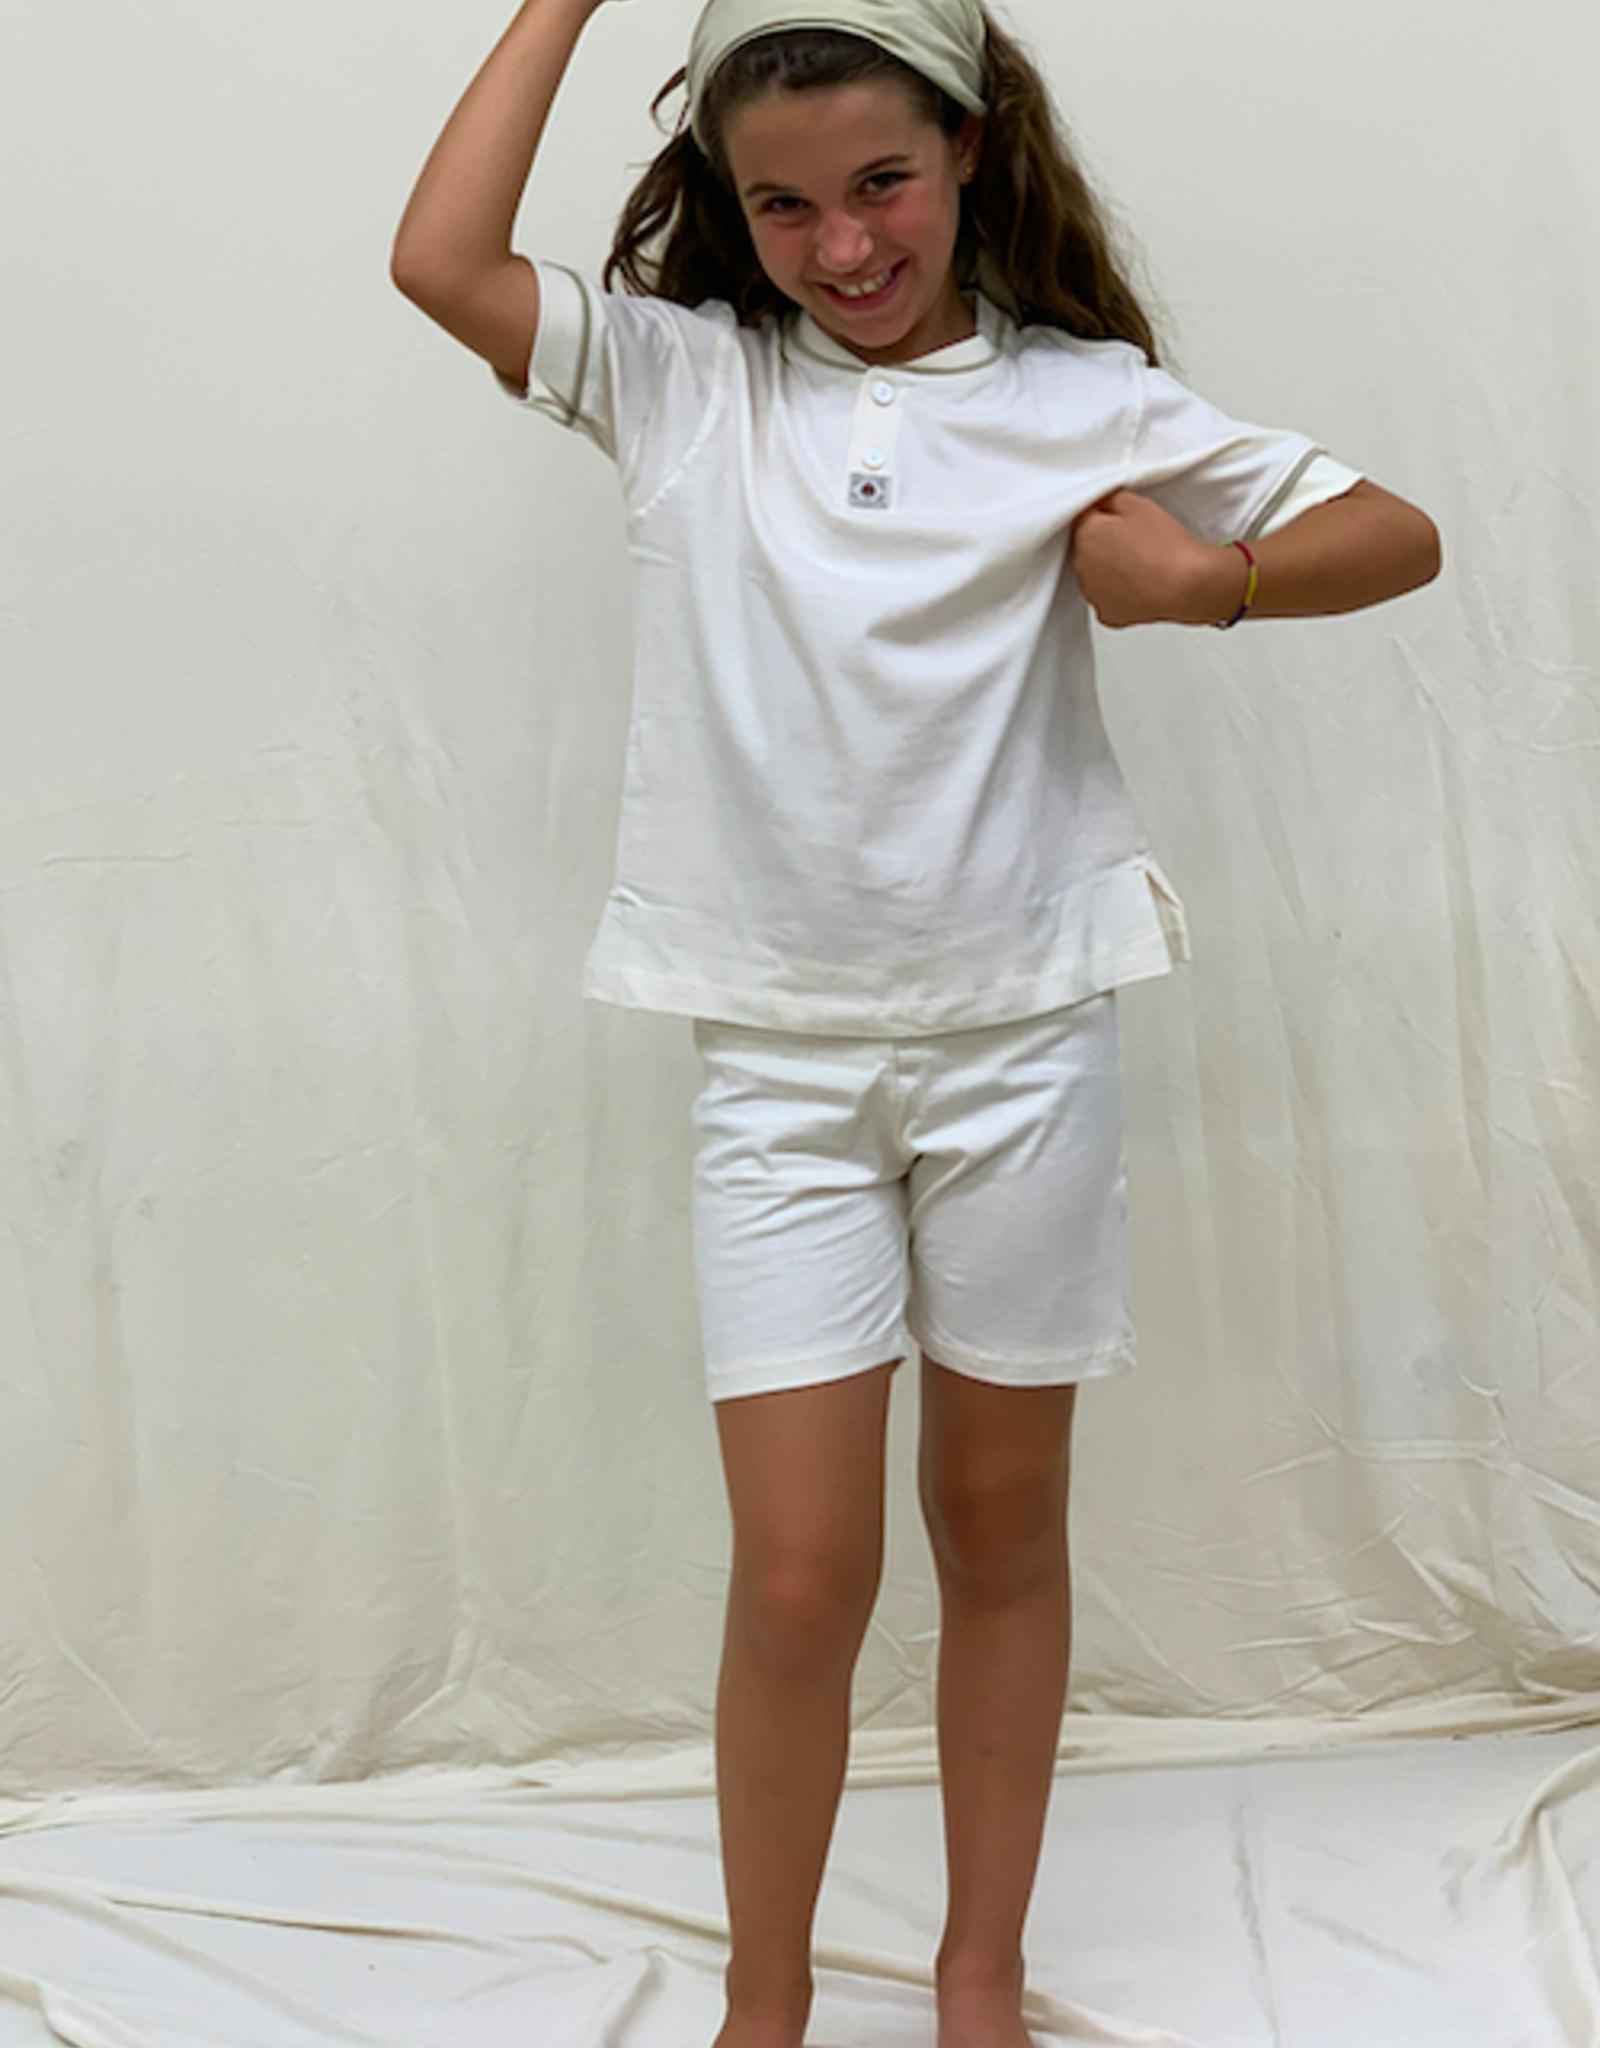 Pijama junior cerrado manga corta. Tallas 8, 10, 12 años.